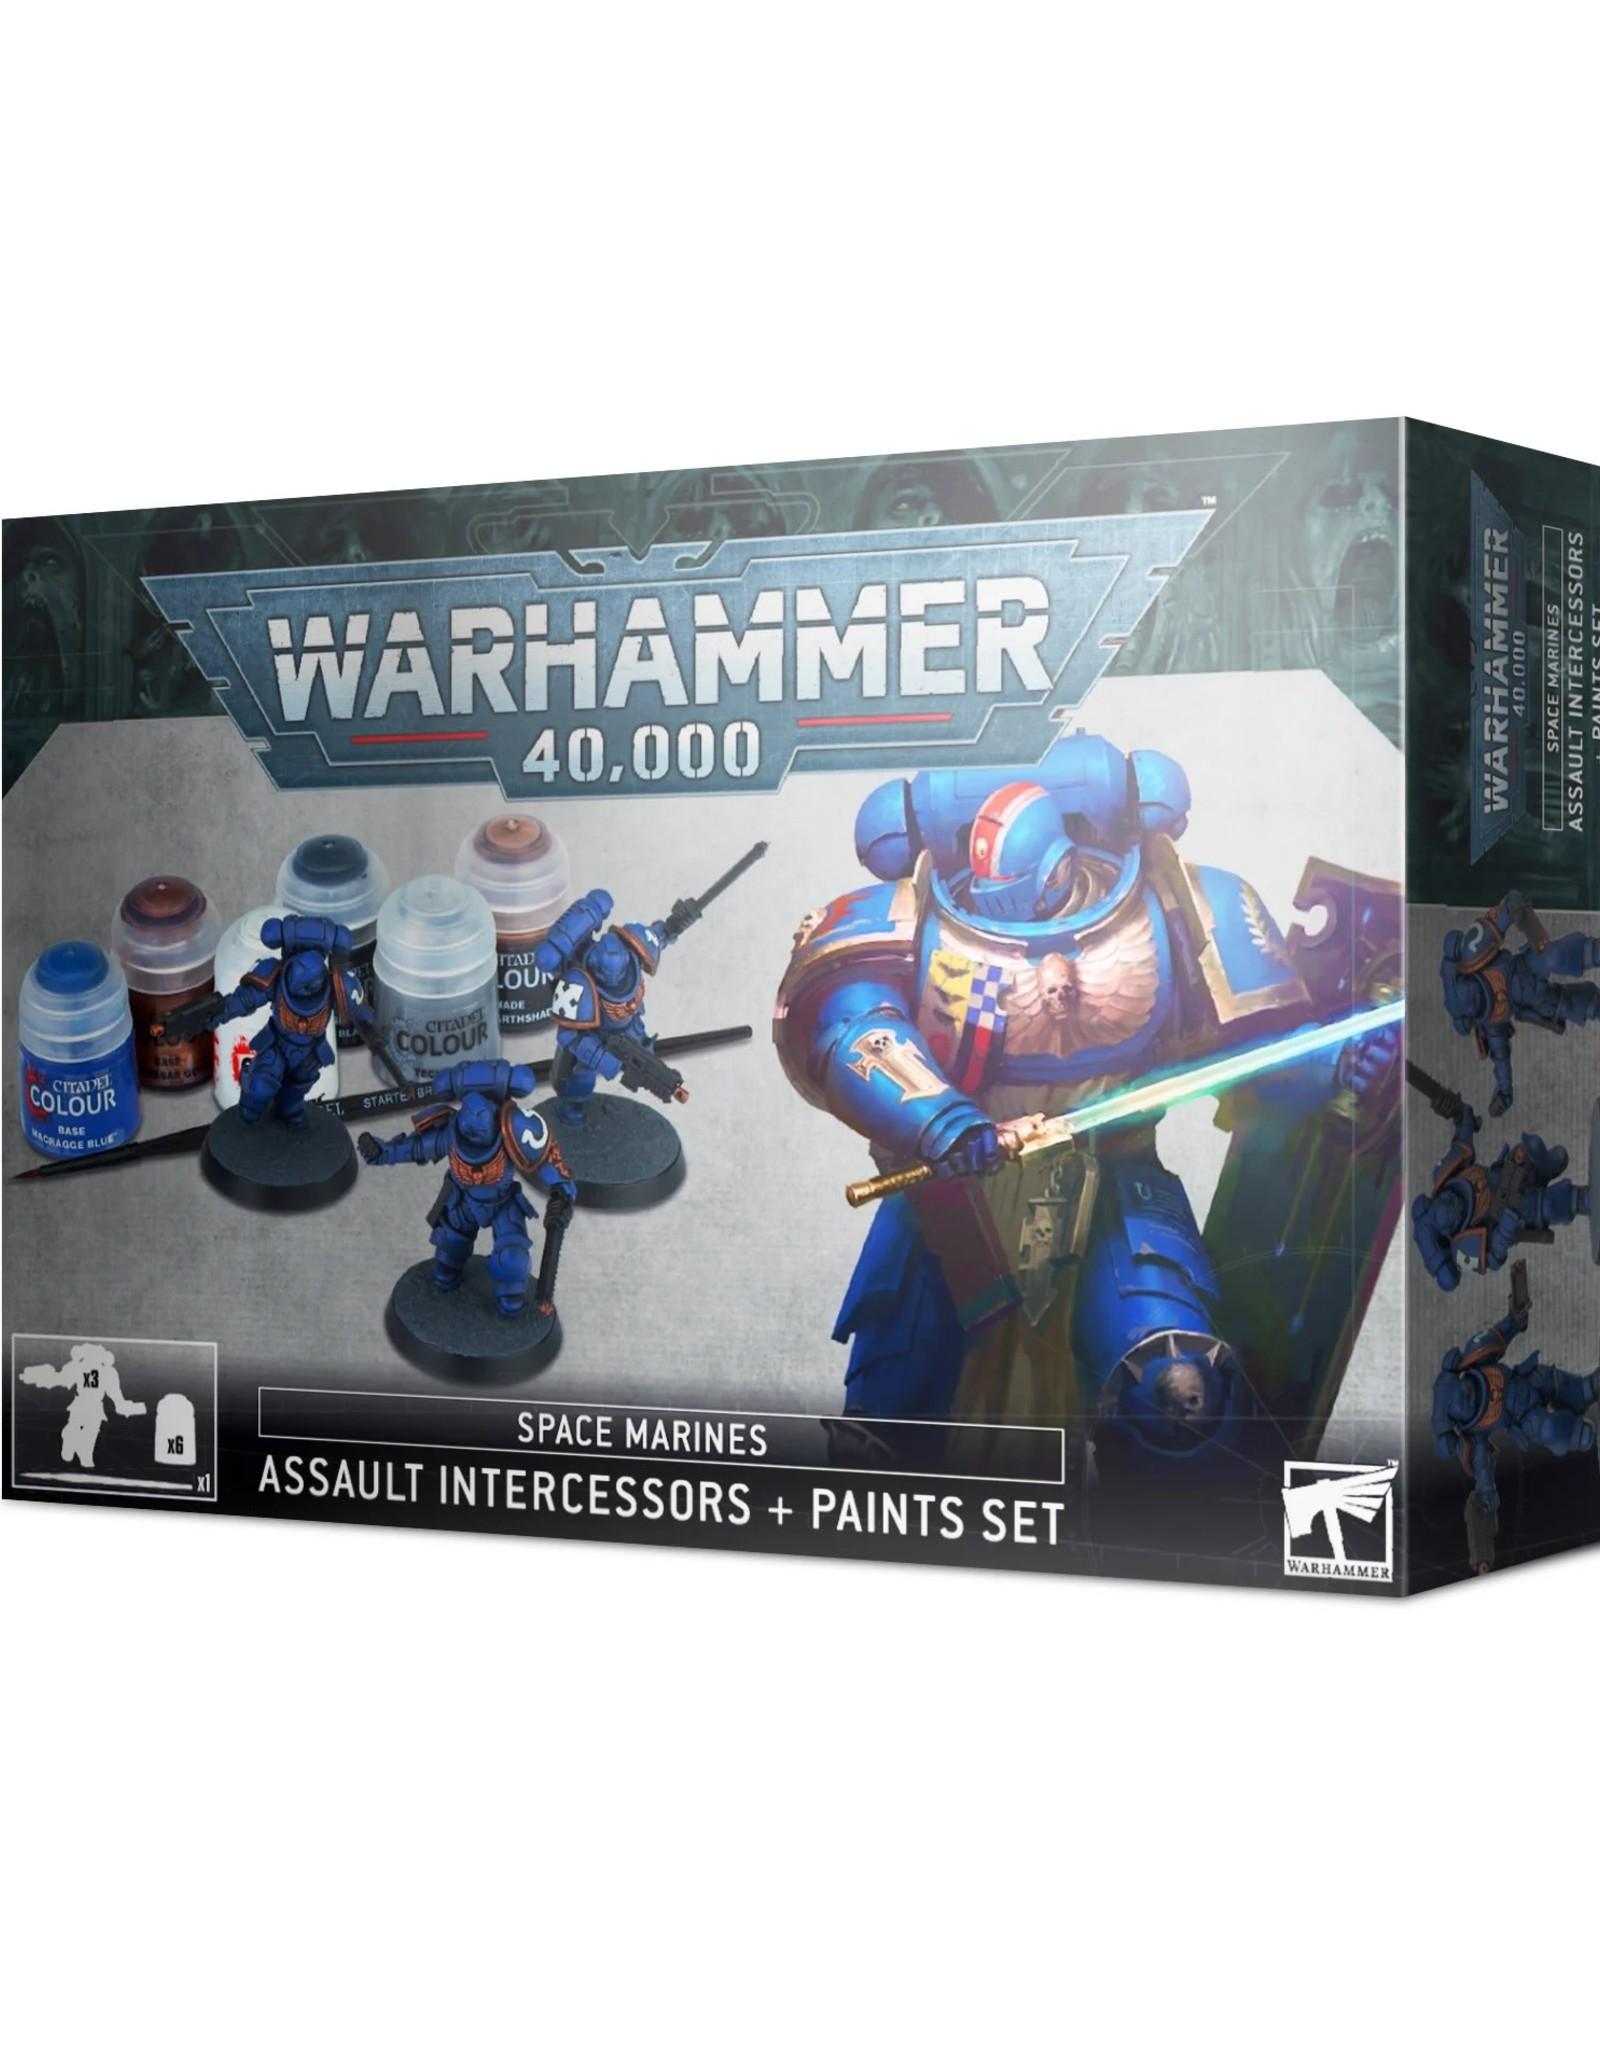 Games Workshop Warhammer 40K Space Marines Assault Intercessors + Paint Set